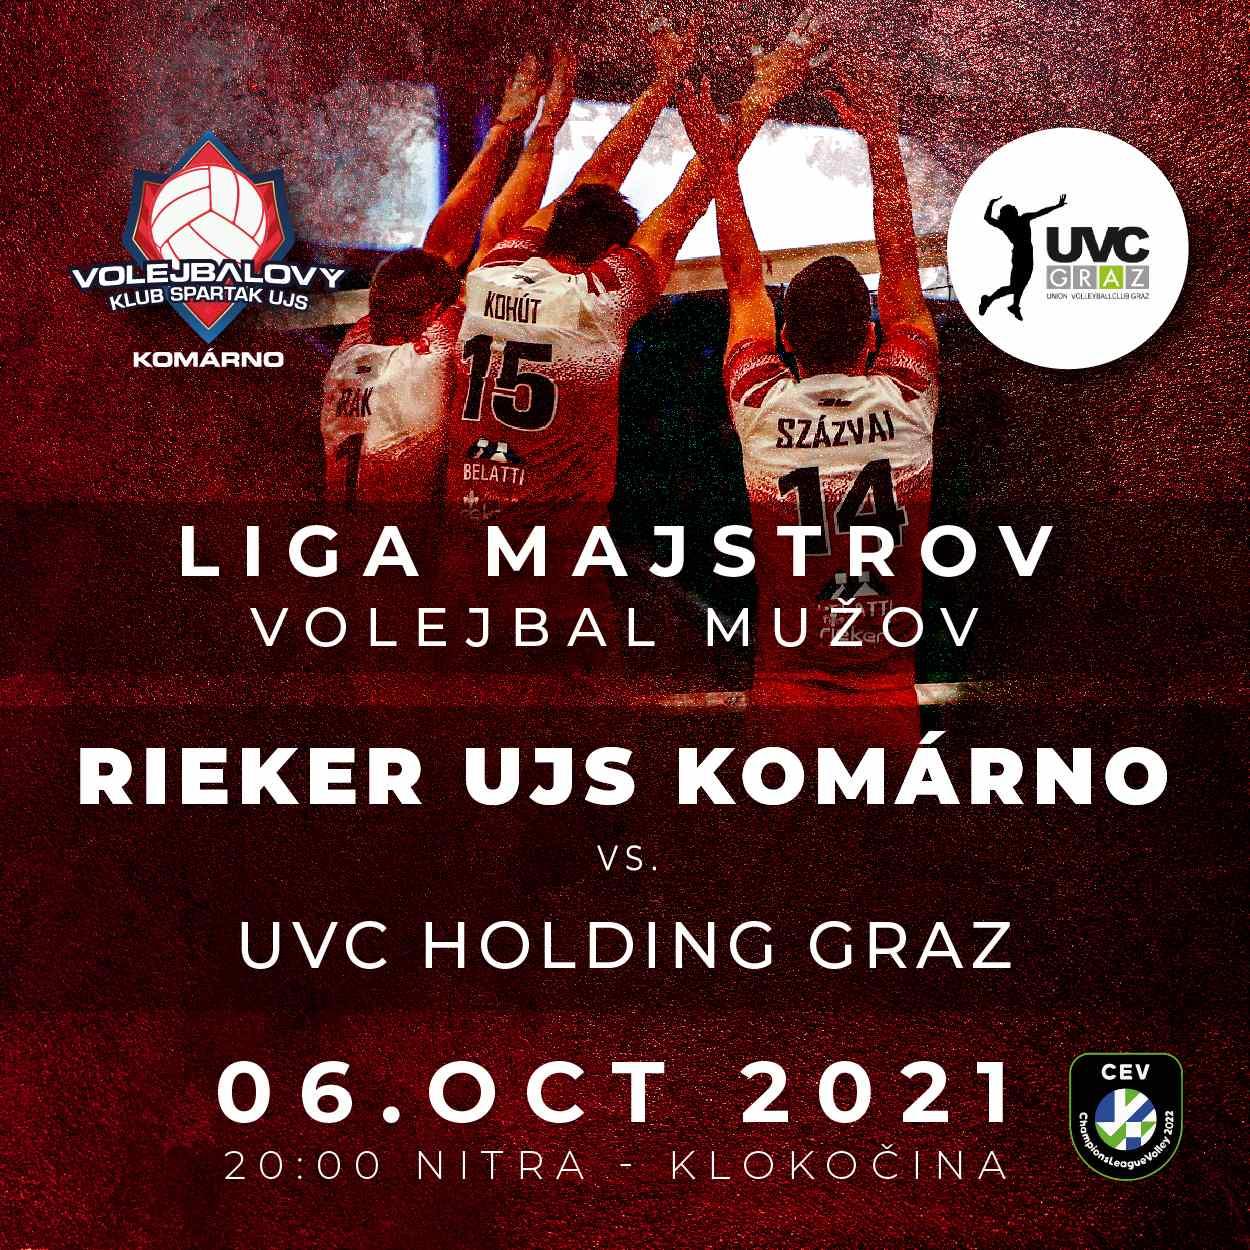 picture Rieker UJS Komárno - UVC HOLDING Graz